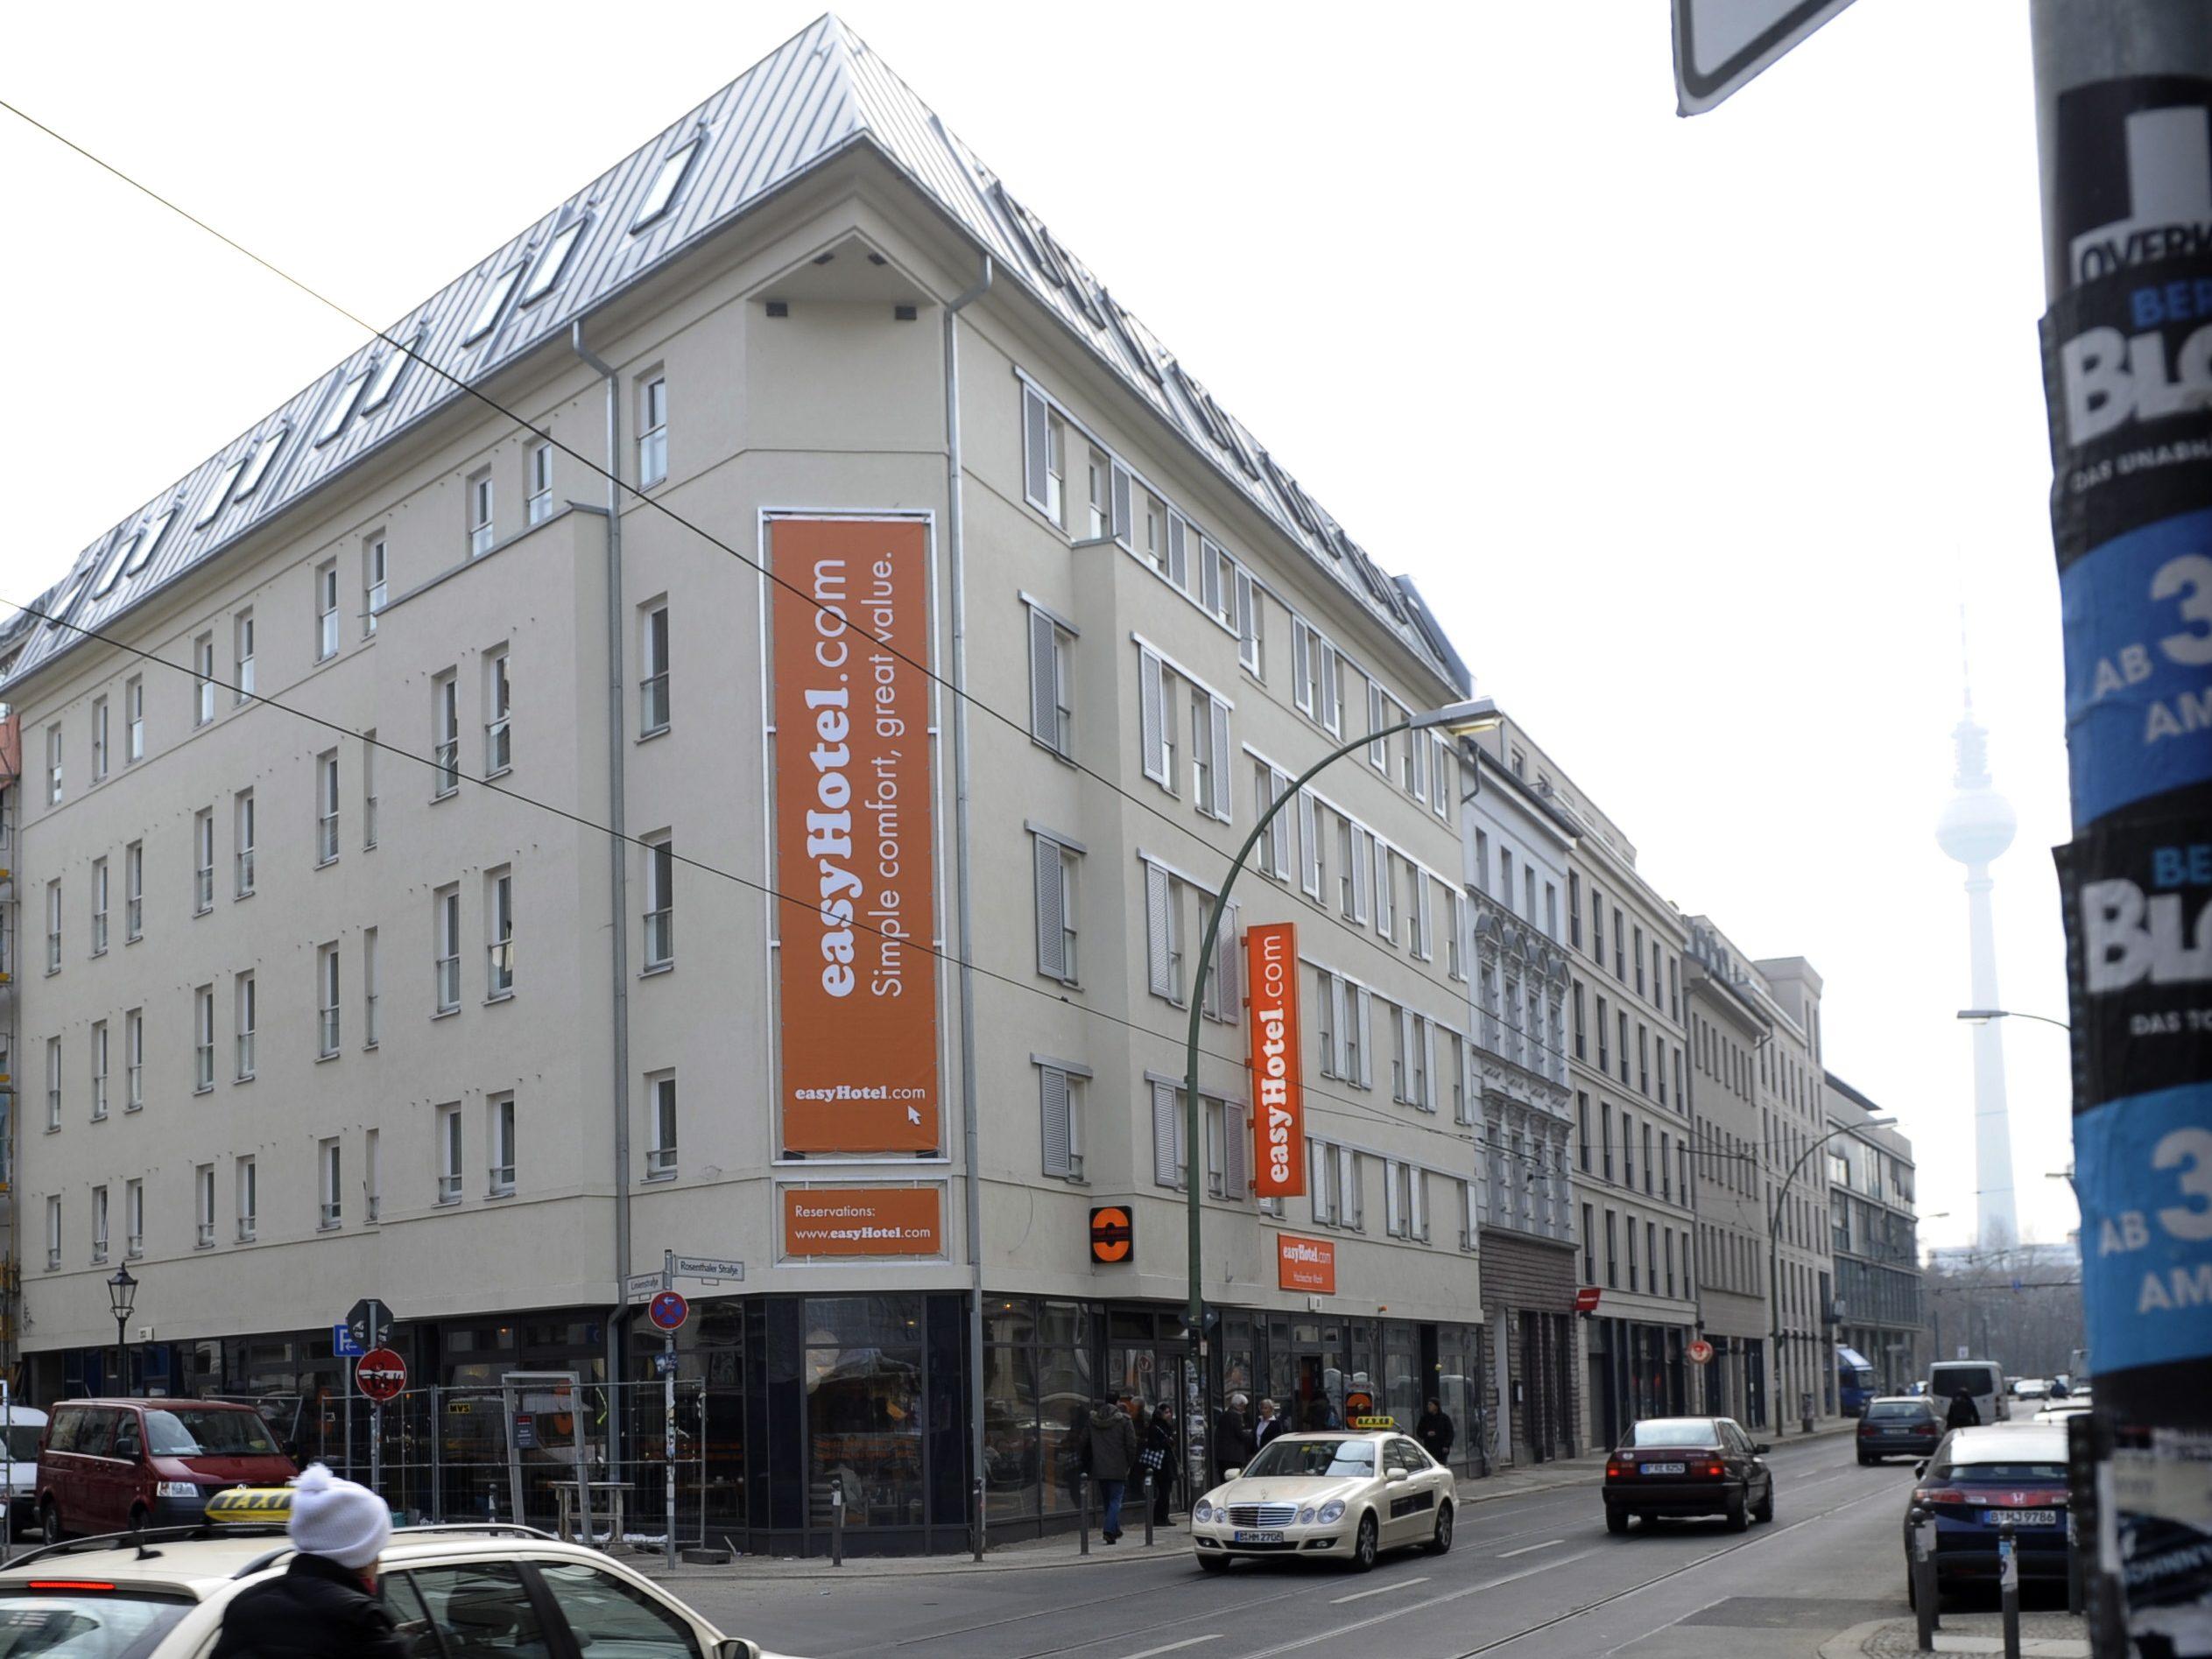 Das Easyhotel am Rosenthaler Platz